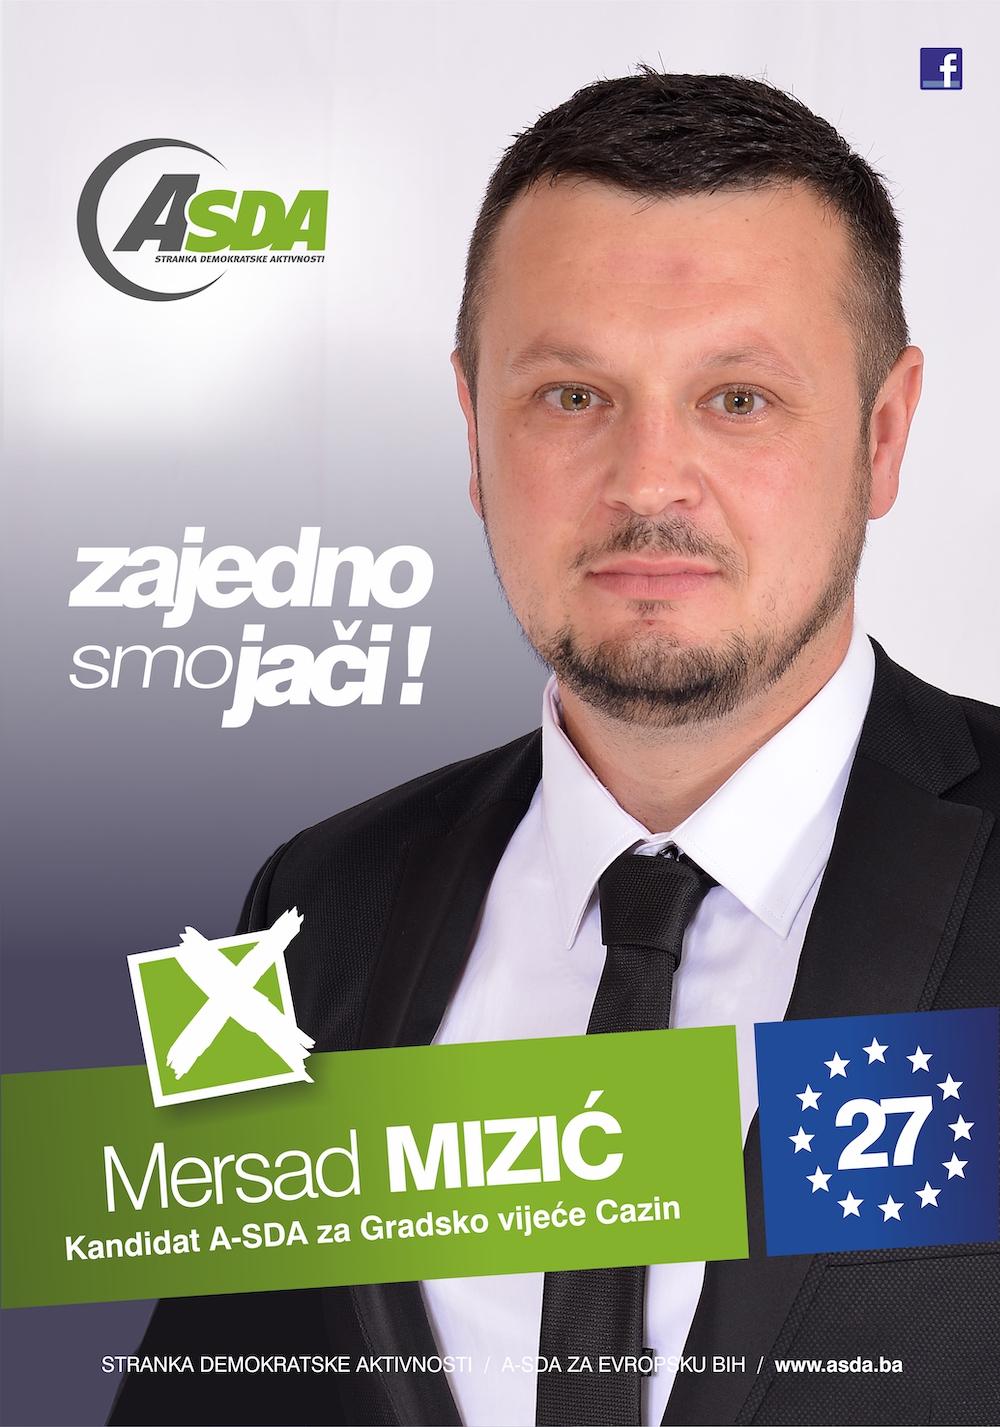 Mersad Mizić